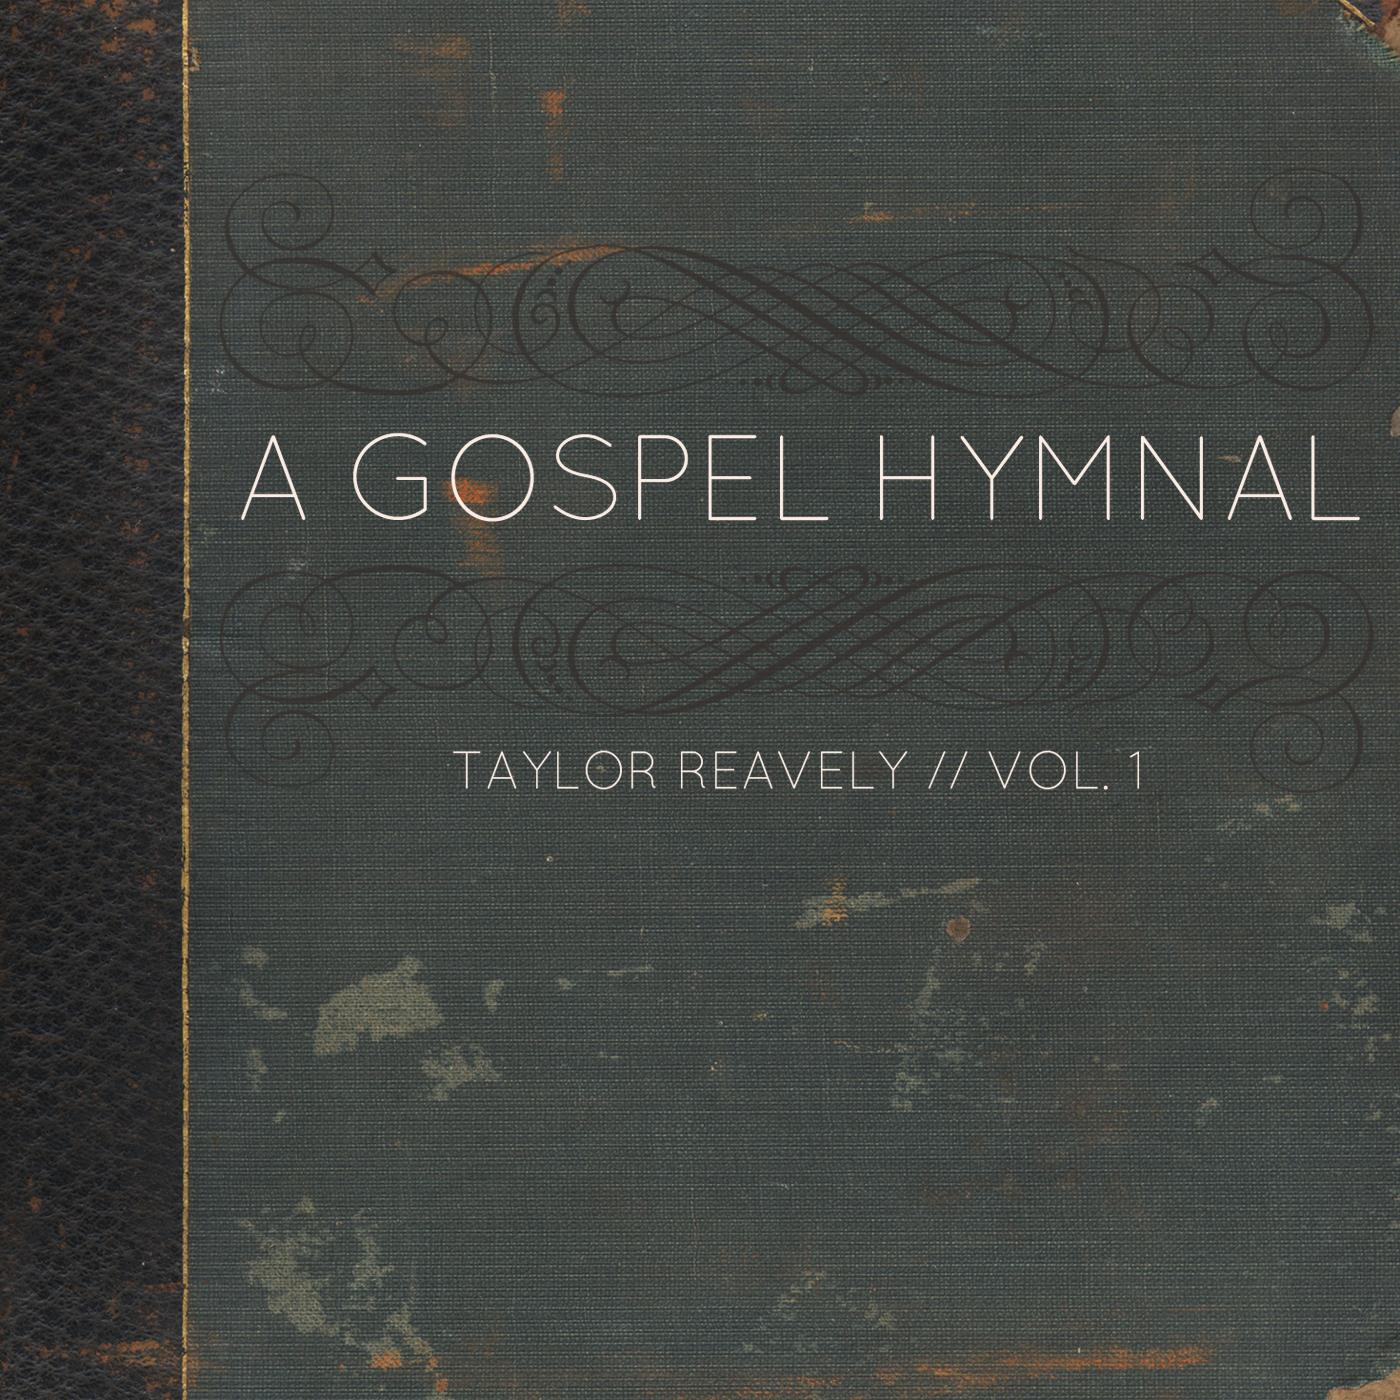 A Gospel Hymnal Vol 1 Artwork_Sticker.jpg